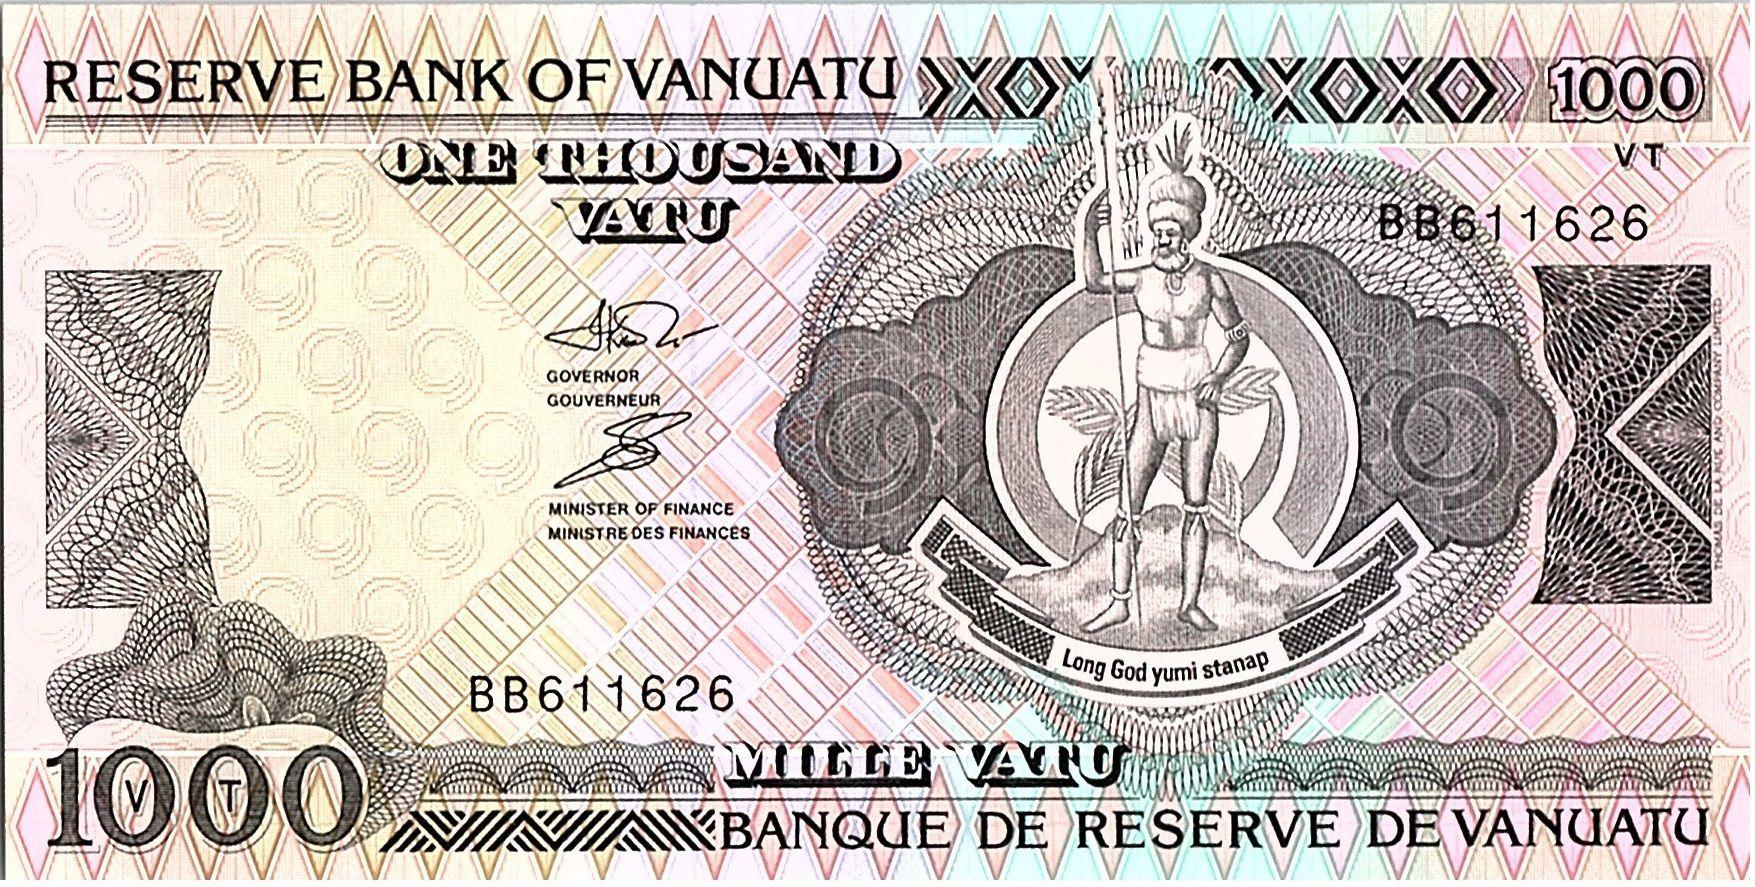 Vanuatu 1000 Vatu  - Chef Mélanésien, Bateau polynésien - 1993 Préfixe BB